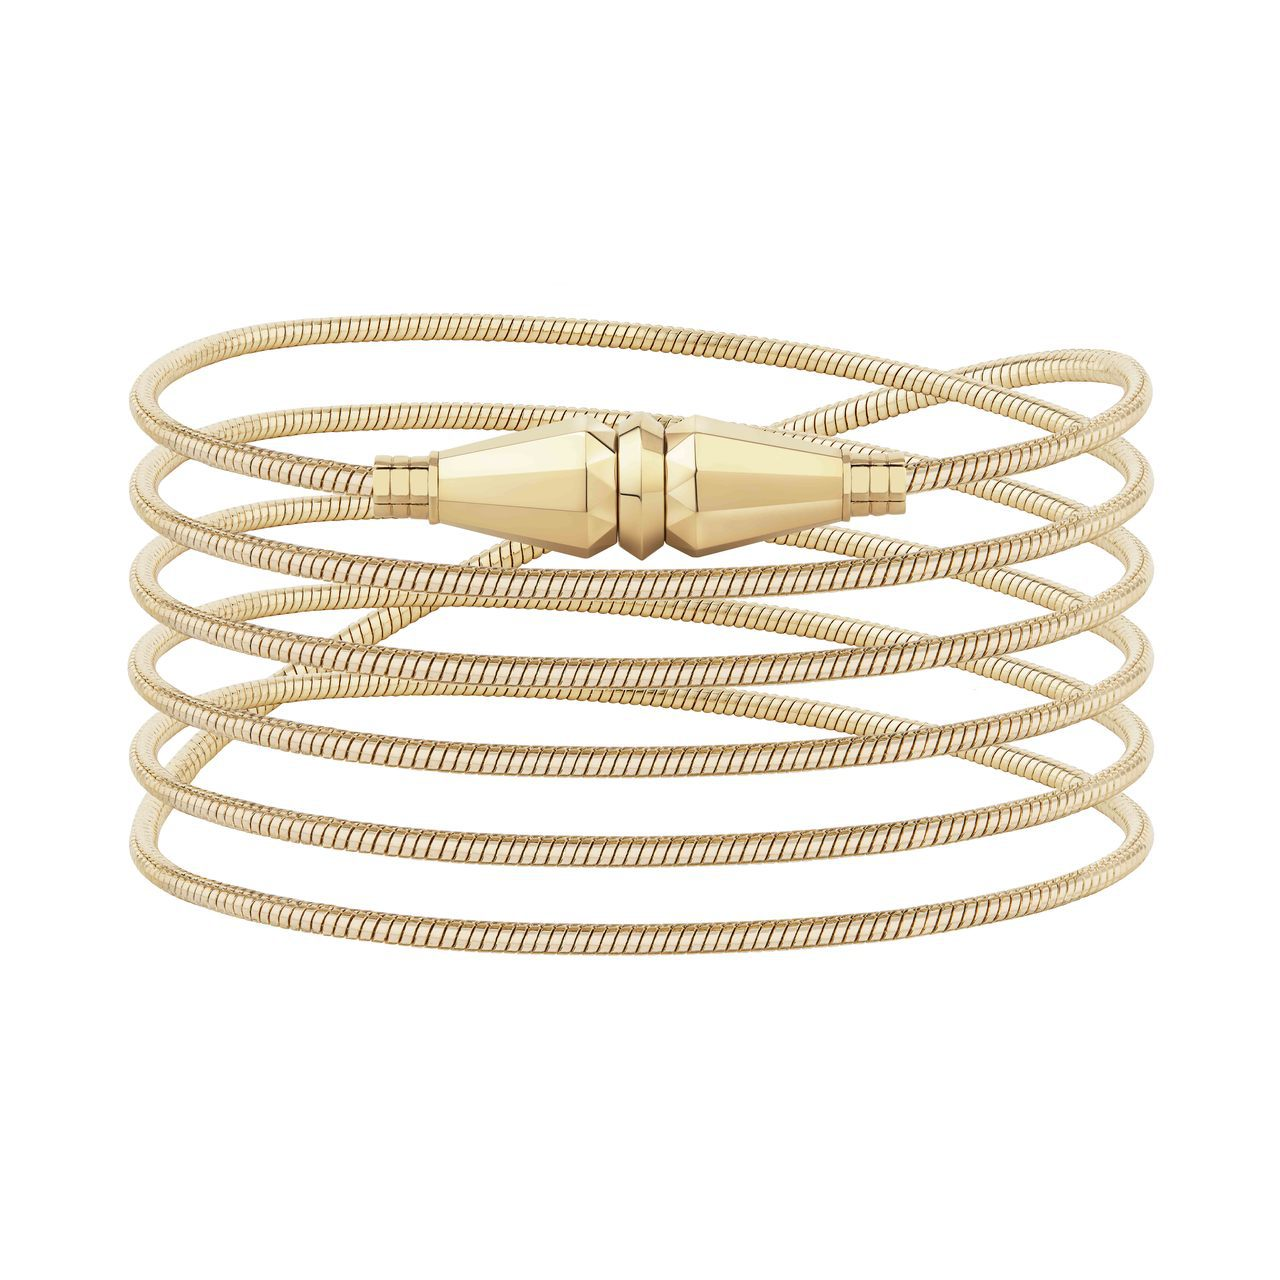 Jack系列18K黃金手鍊,32萬8,000元。圖/寶詩龍提供